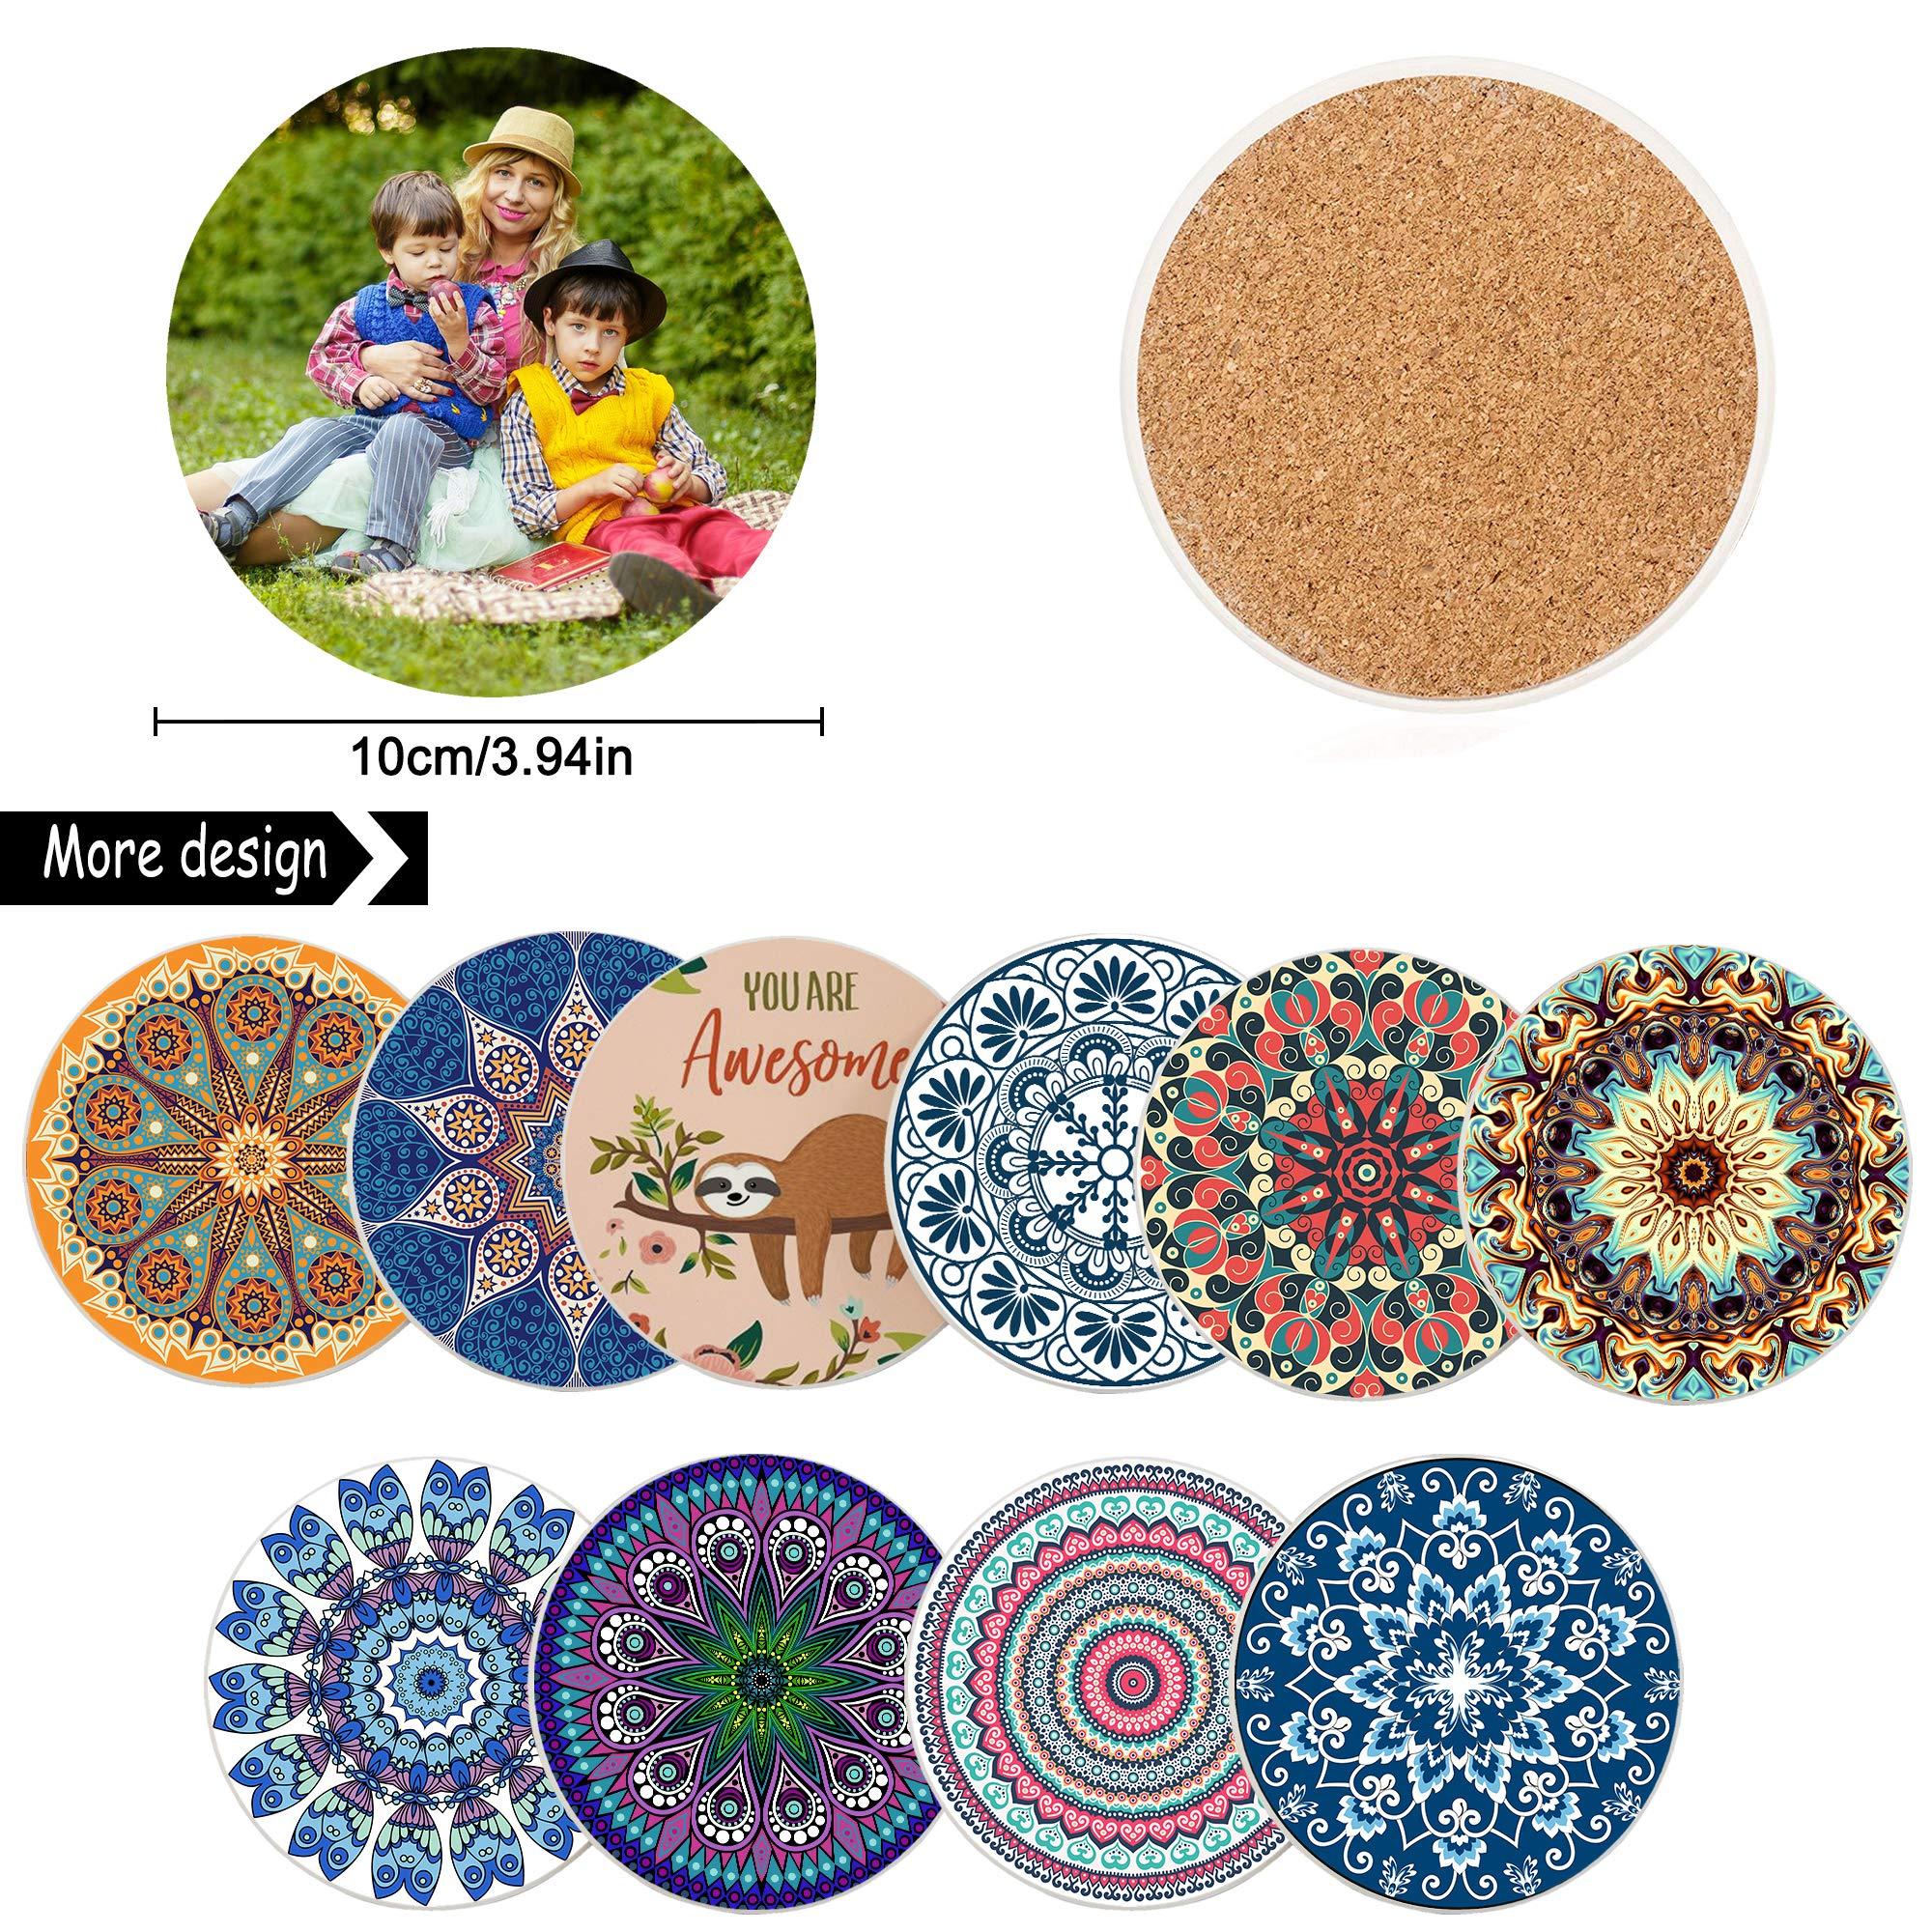 Handmade Tile Resin Coasters Set of 4 Customized Drink Coasters Misfits